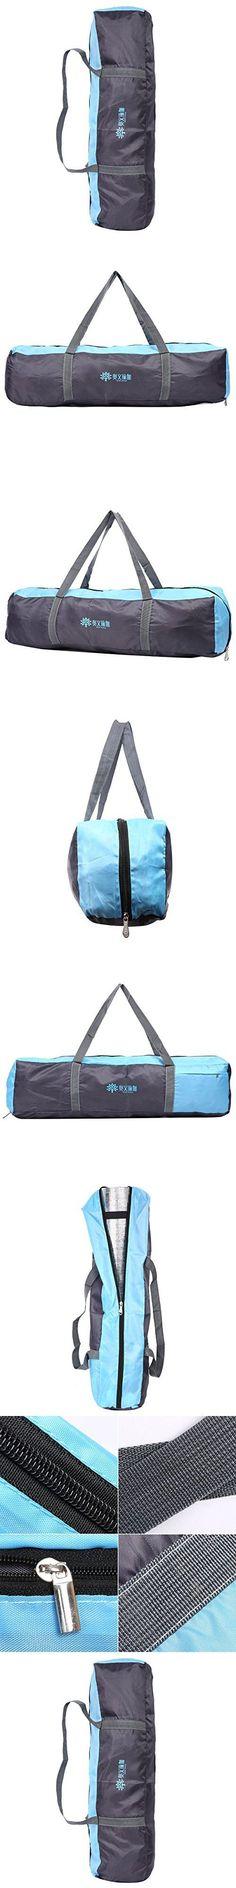 Eshow Lightweight Yoga Backpack Durable Organic Yoga Mat Bag Yoga Tote Bag Blue